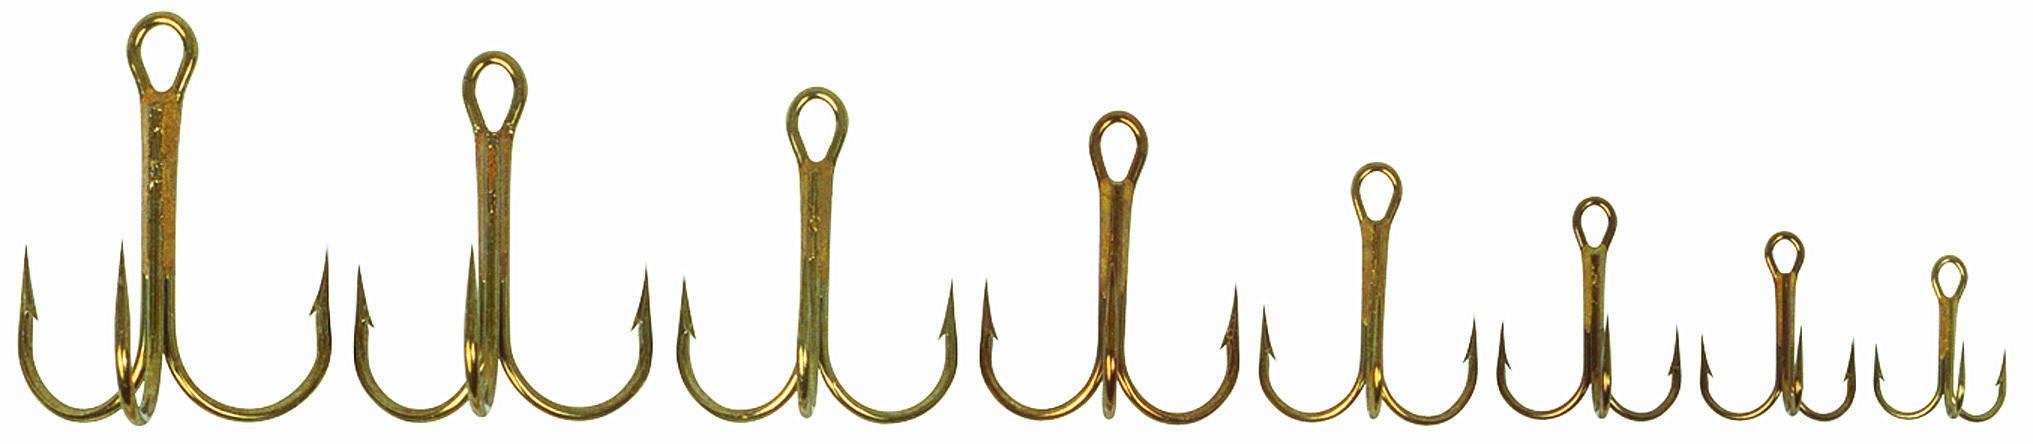 Darts trekrok brons